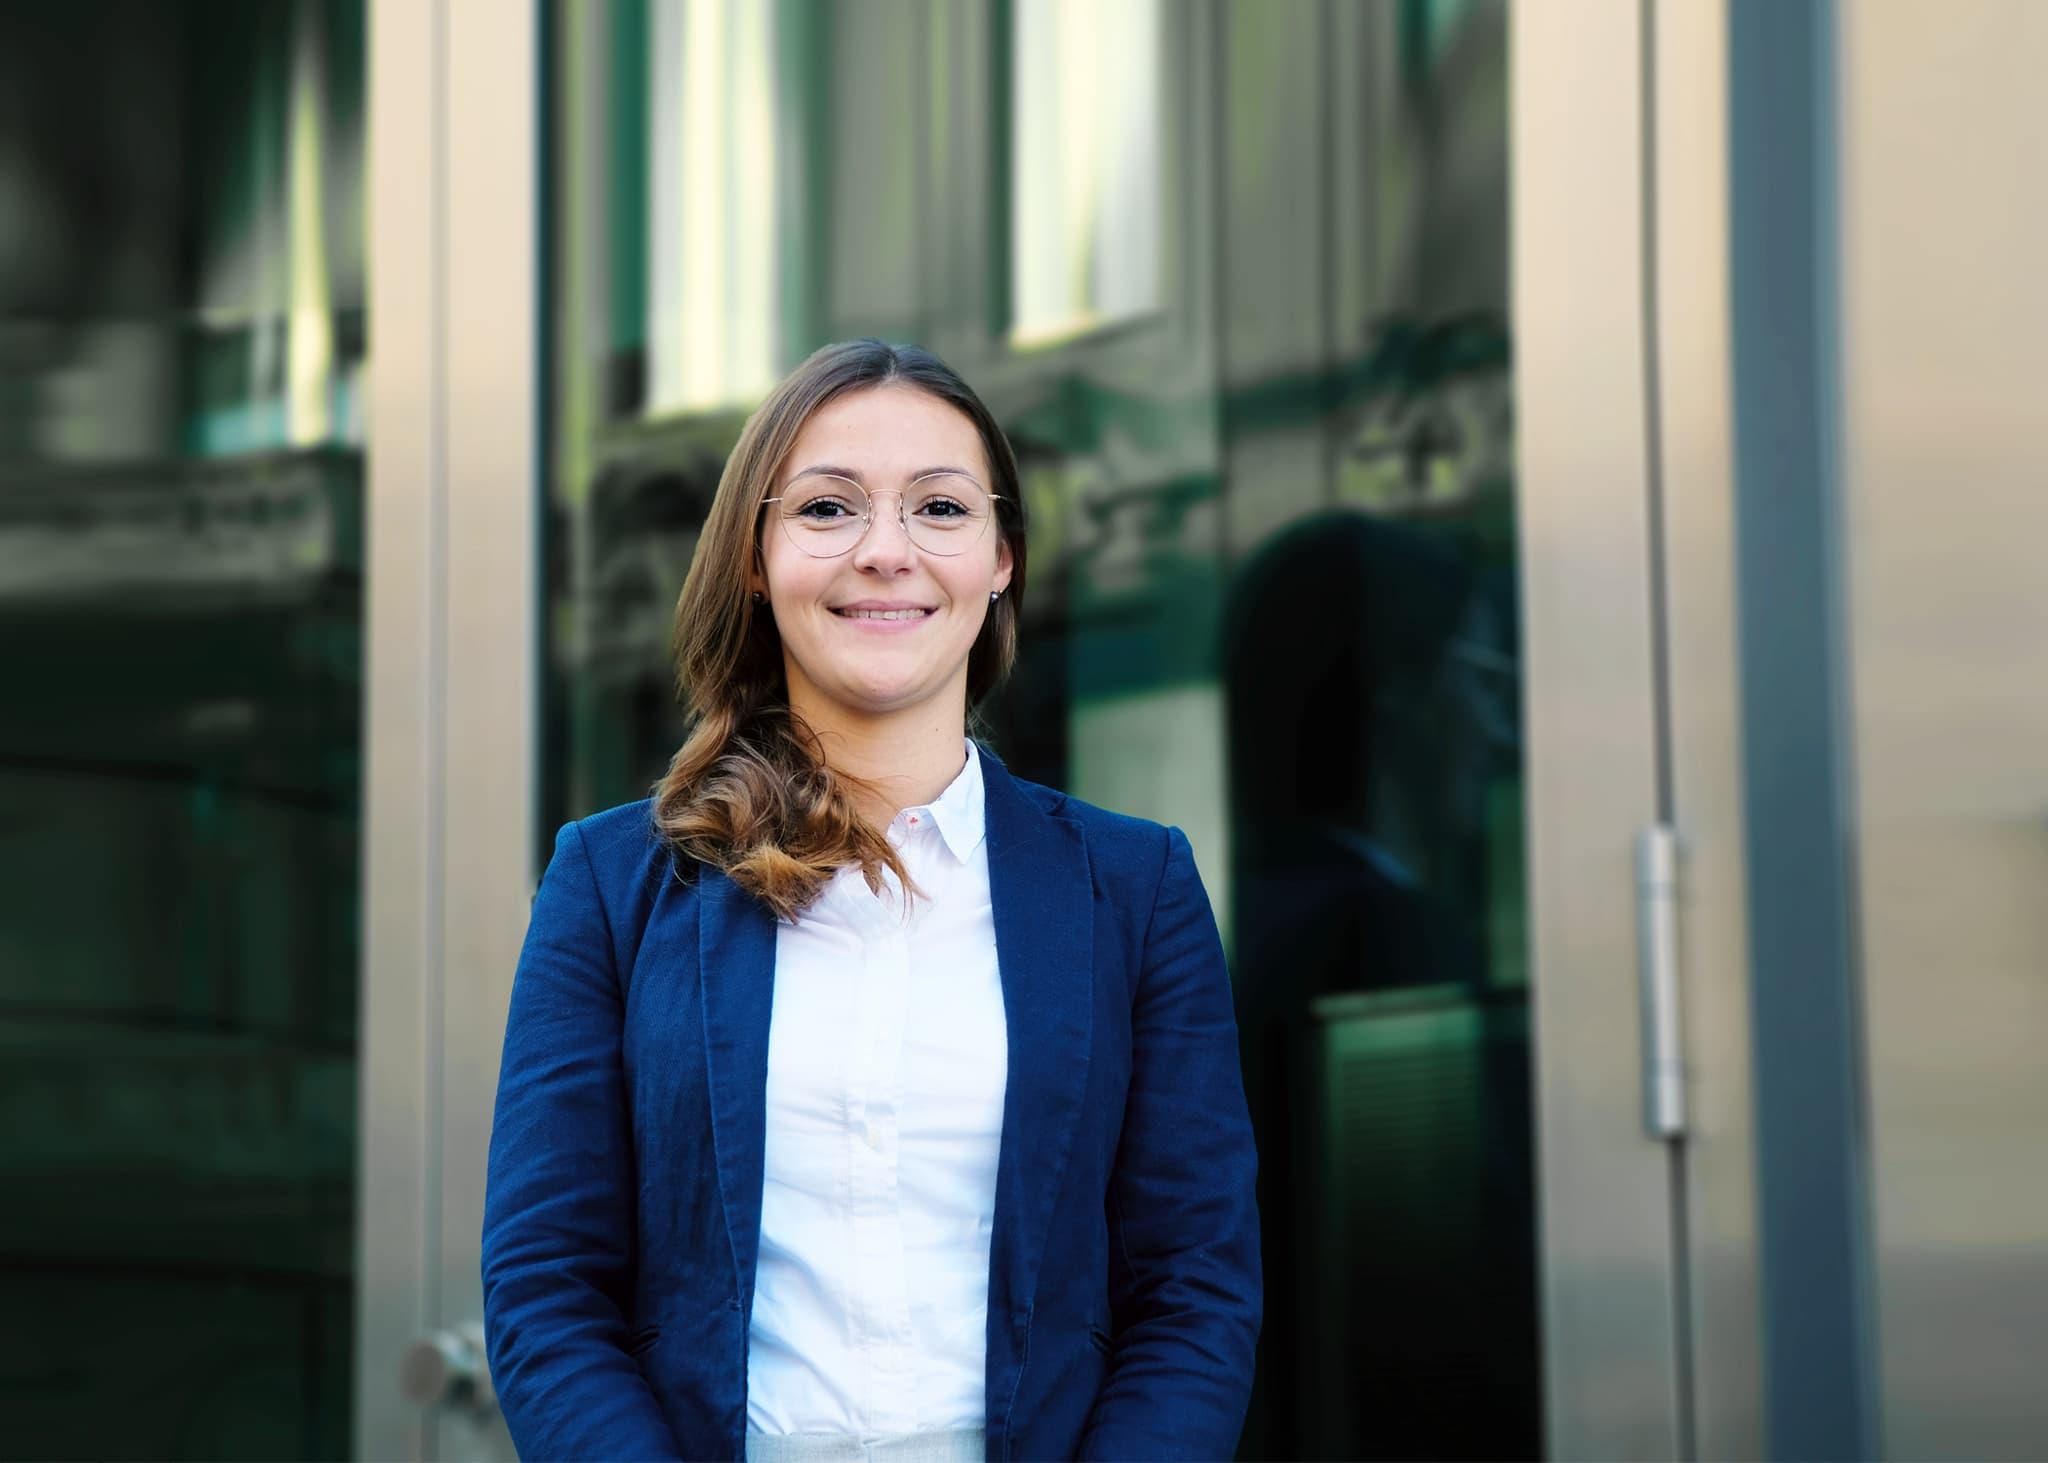 Miriam Bainczyk, Assessorin iur.